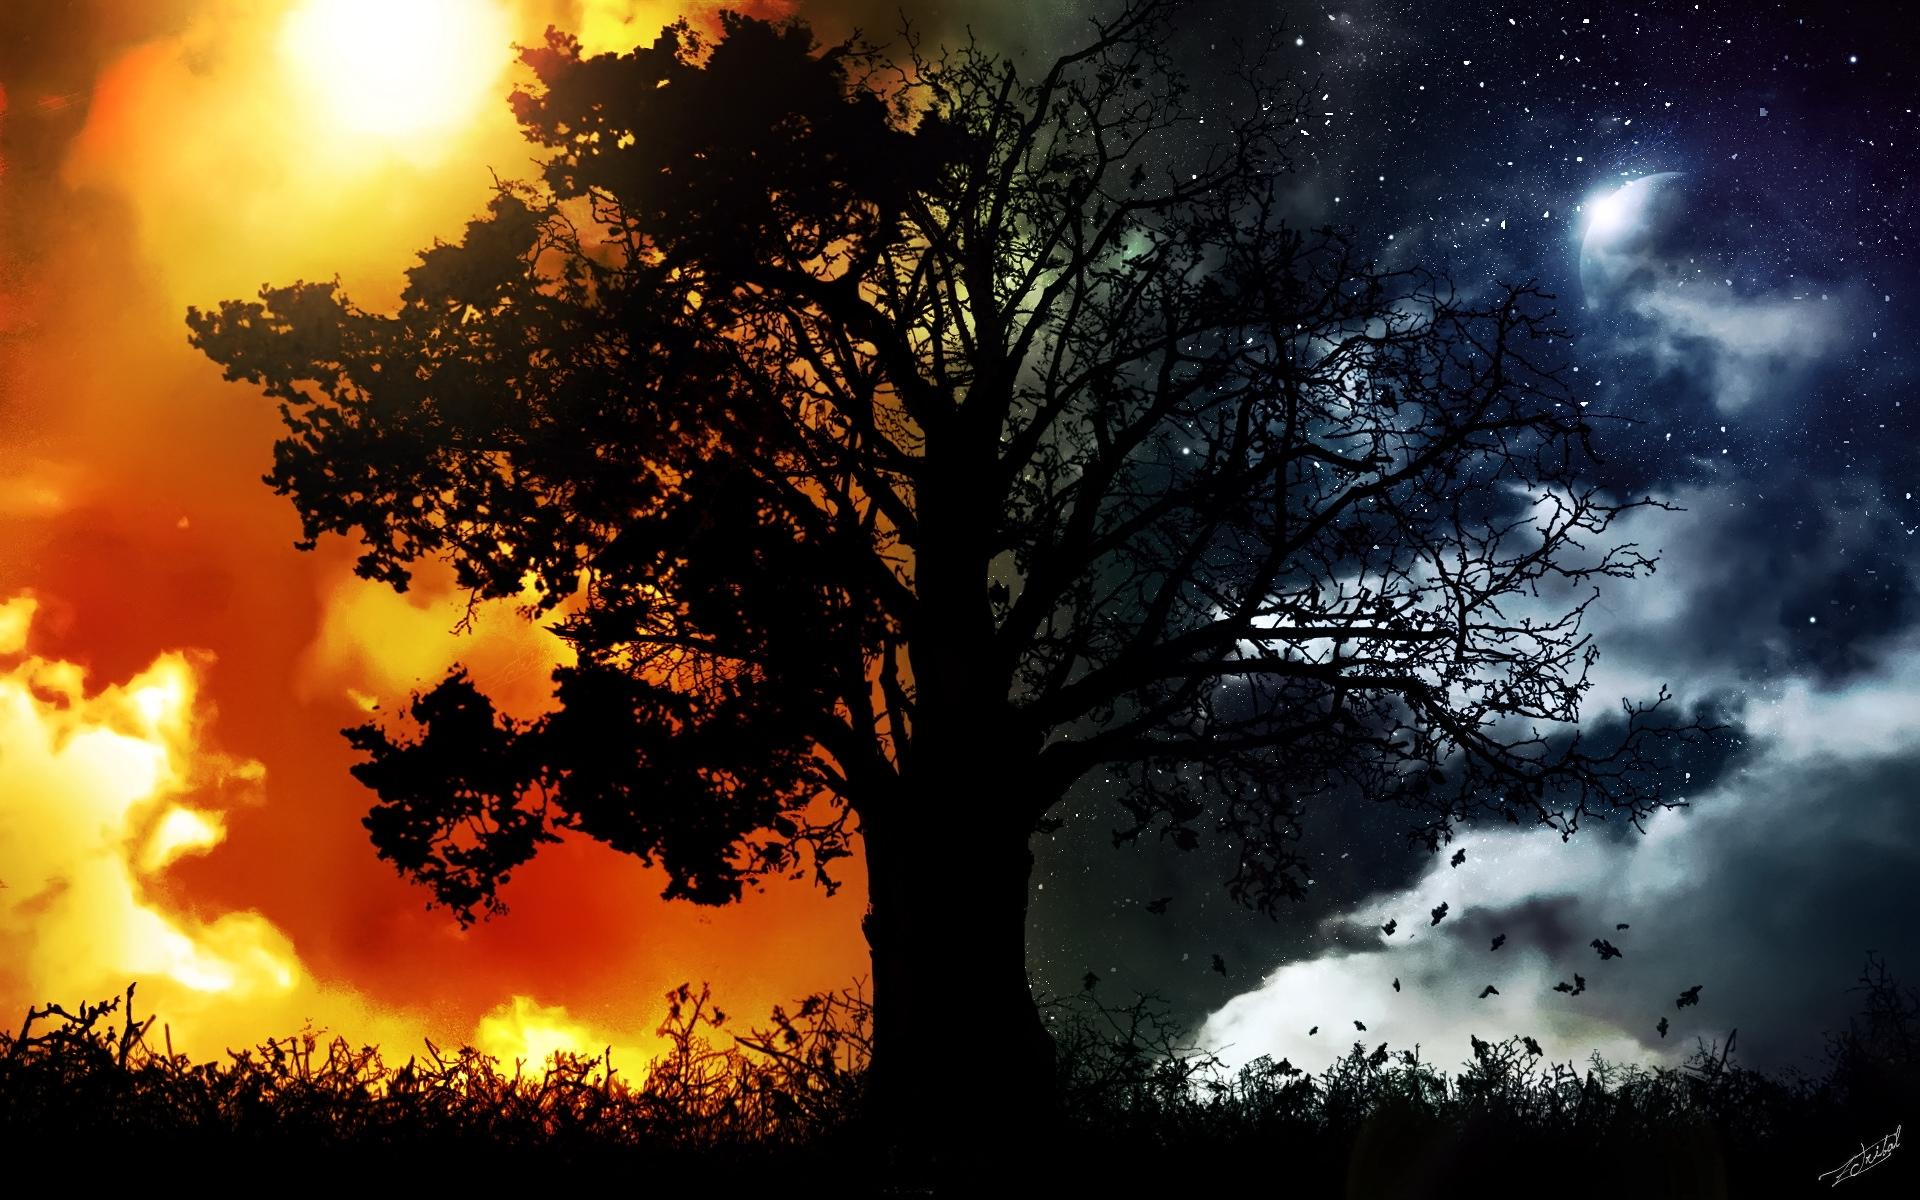 тот картинки ночи и дня сидя спинке